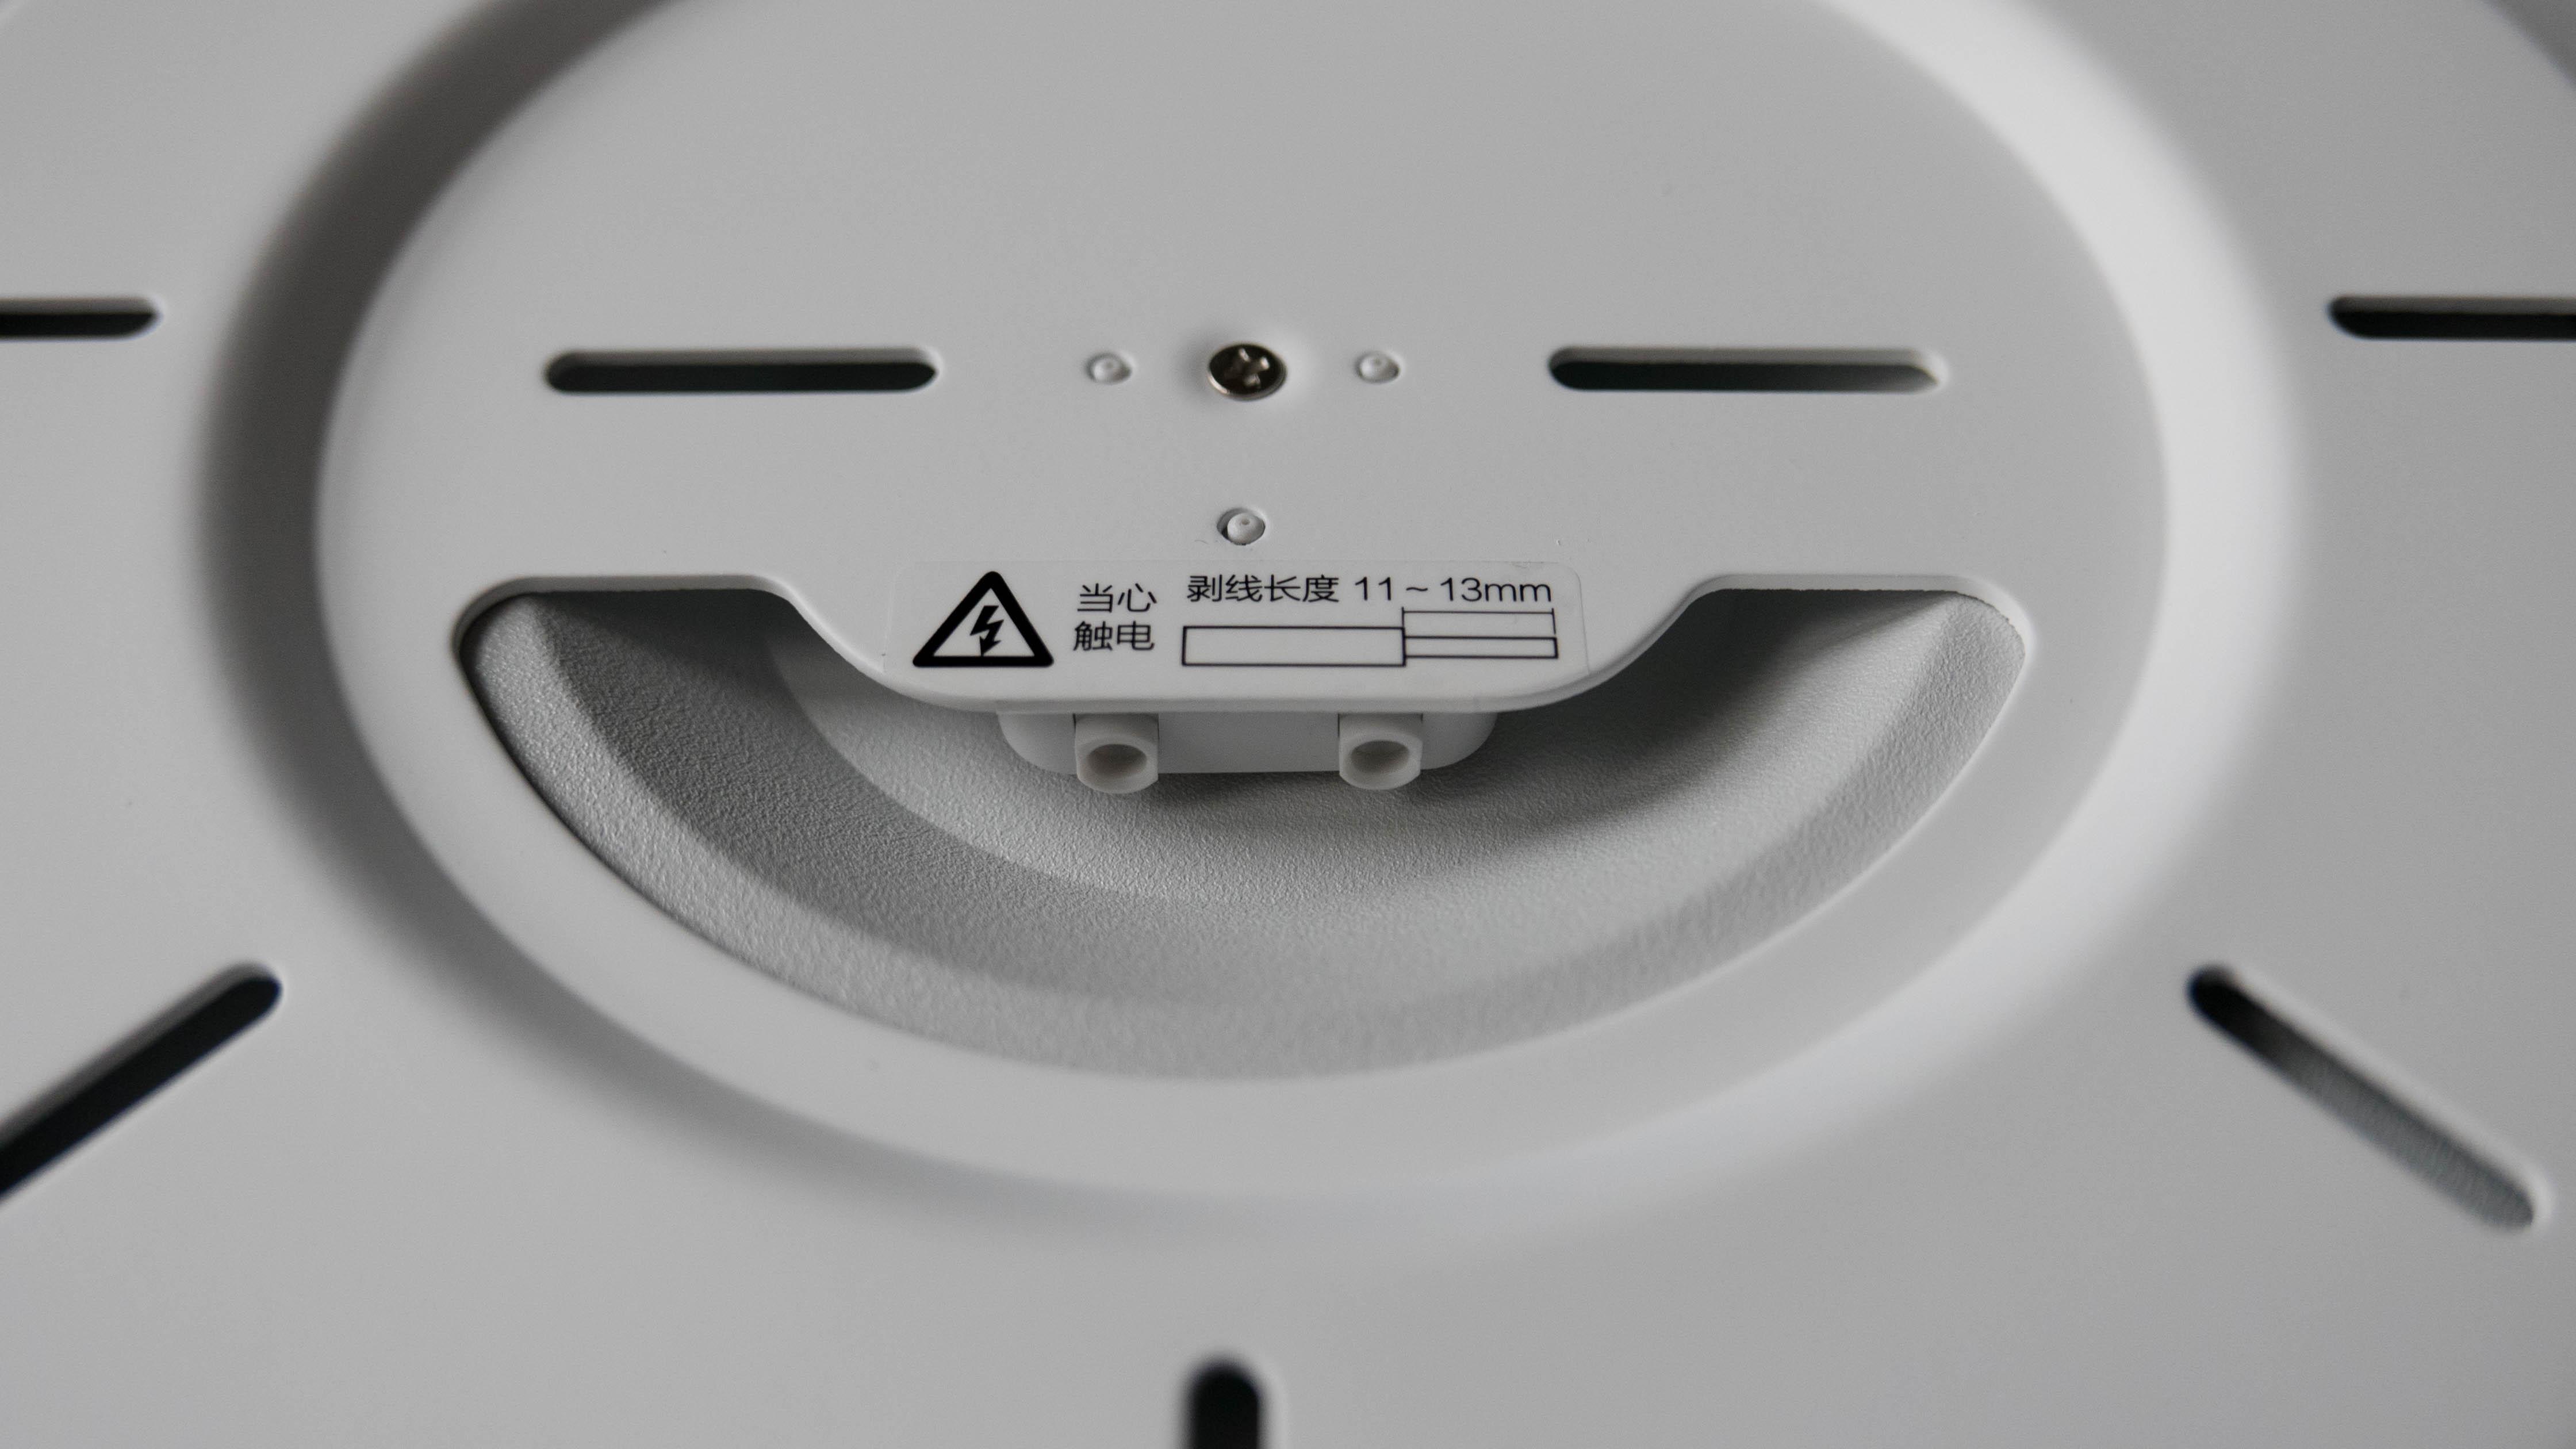 Xiaomi Yeelight LED Ceiling Light 9